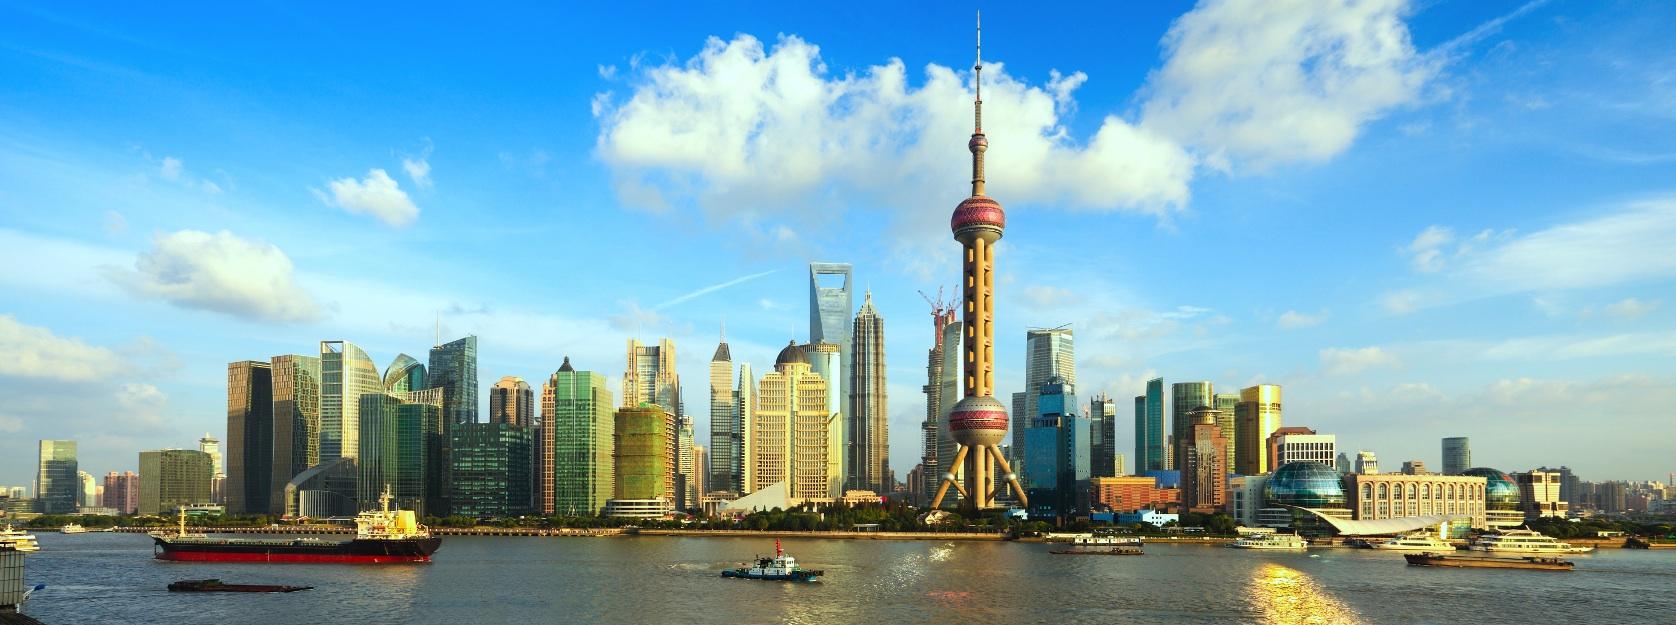 Vue de Shanghaï